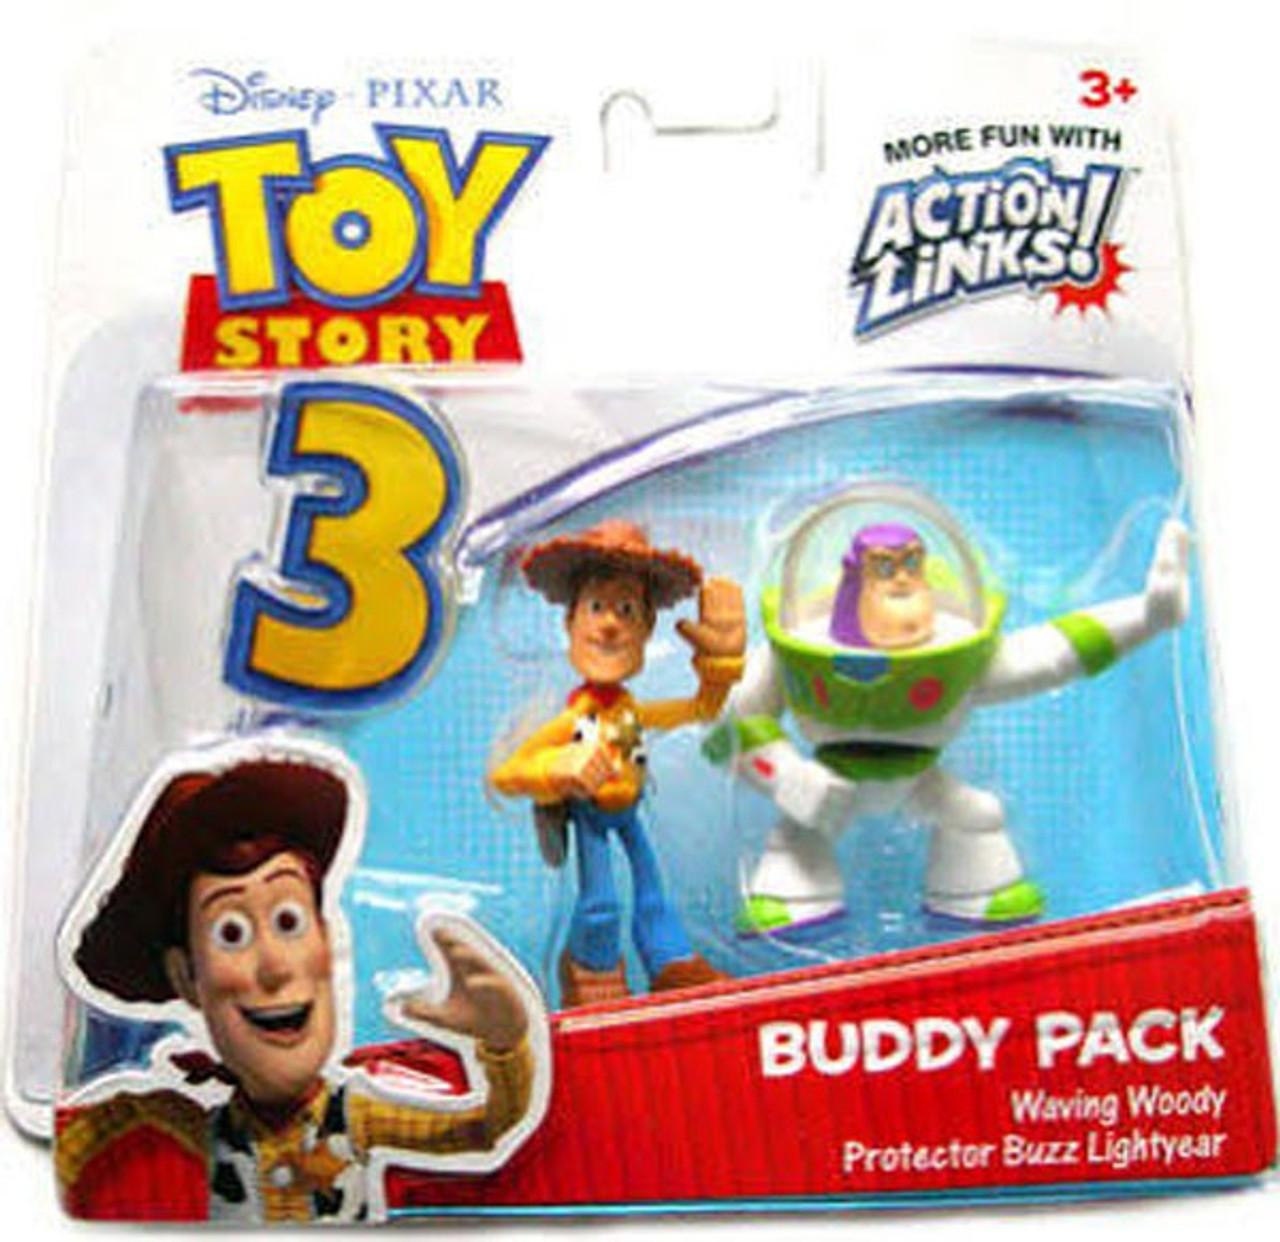 Toy Story 3 Buddy Pack Waving Woody Protector Buzz Lightyear Mini Figure 2- Pack Mattel Toys - ToyWiz c79b802c6e1